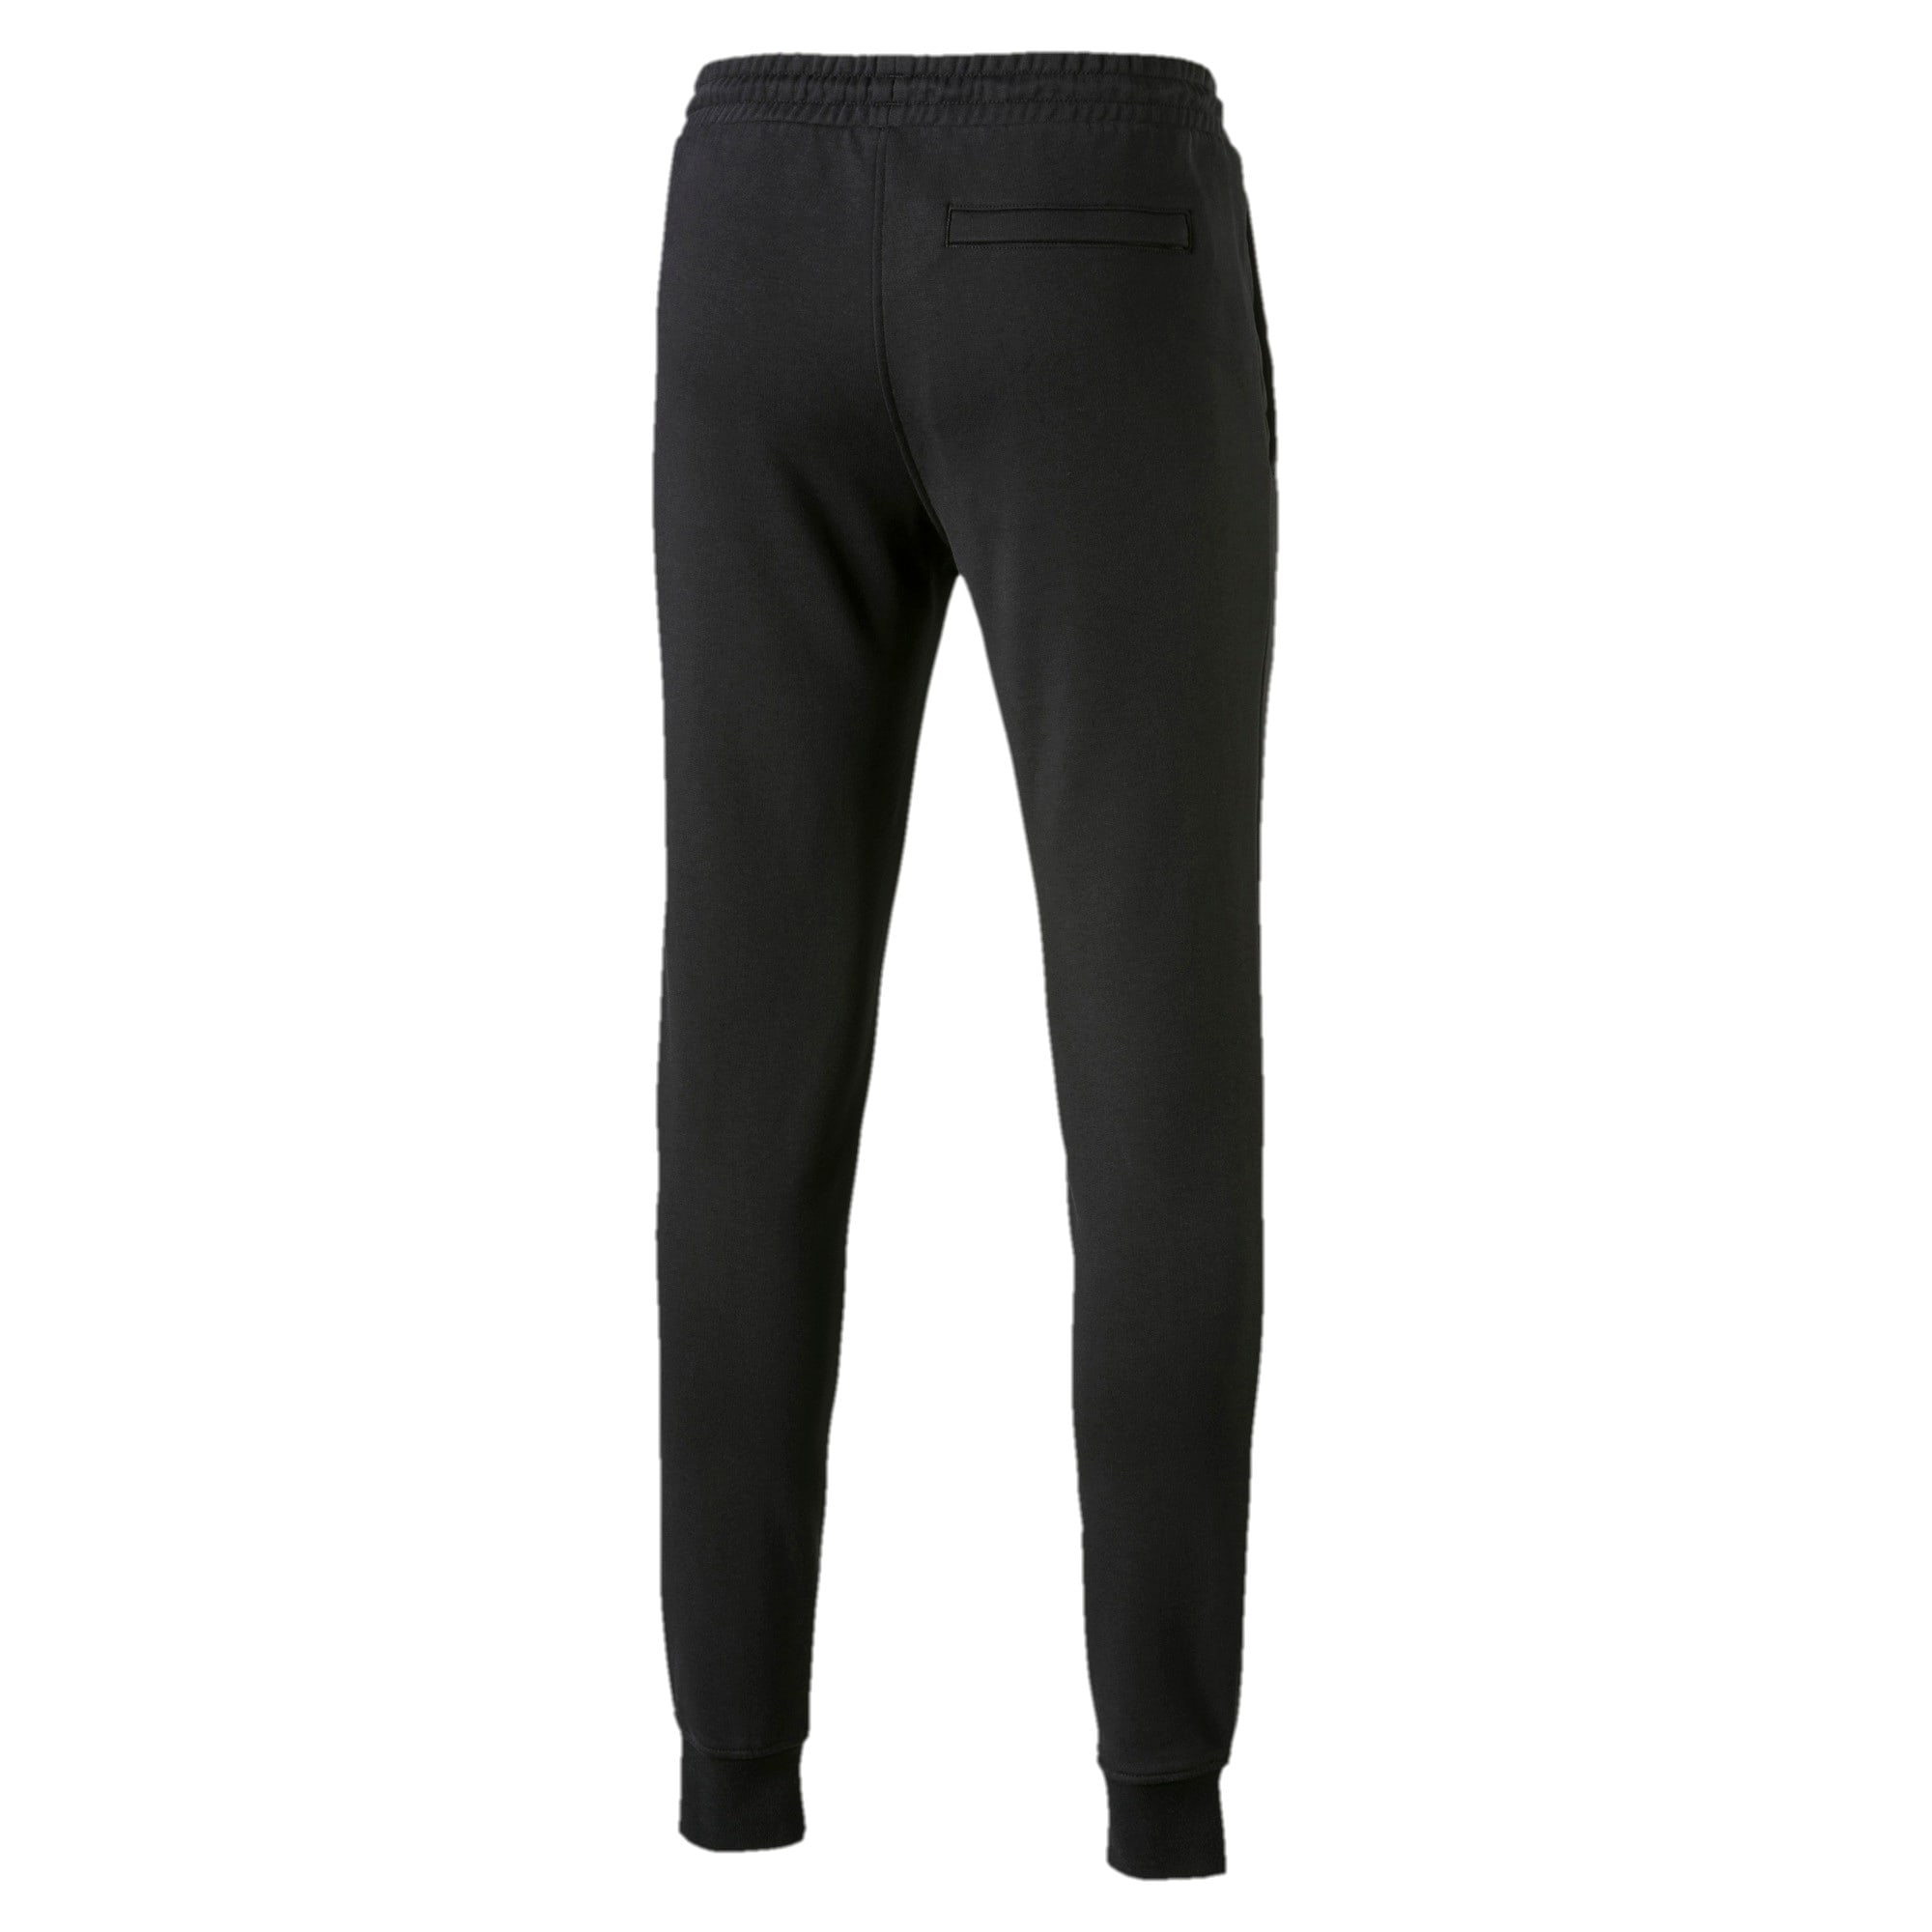 Thumbnail 3 of Classics Men's Cuffed Sweatpants, Cotton Black, medium